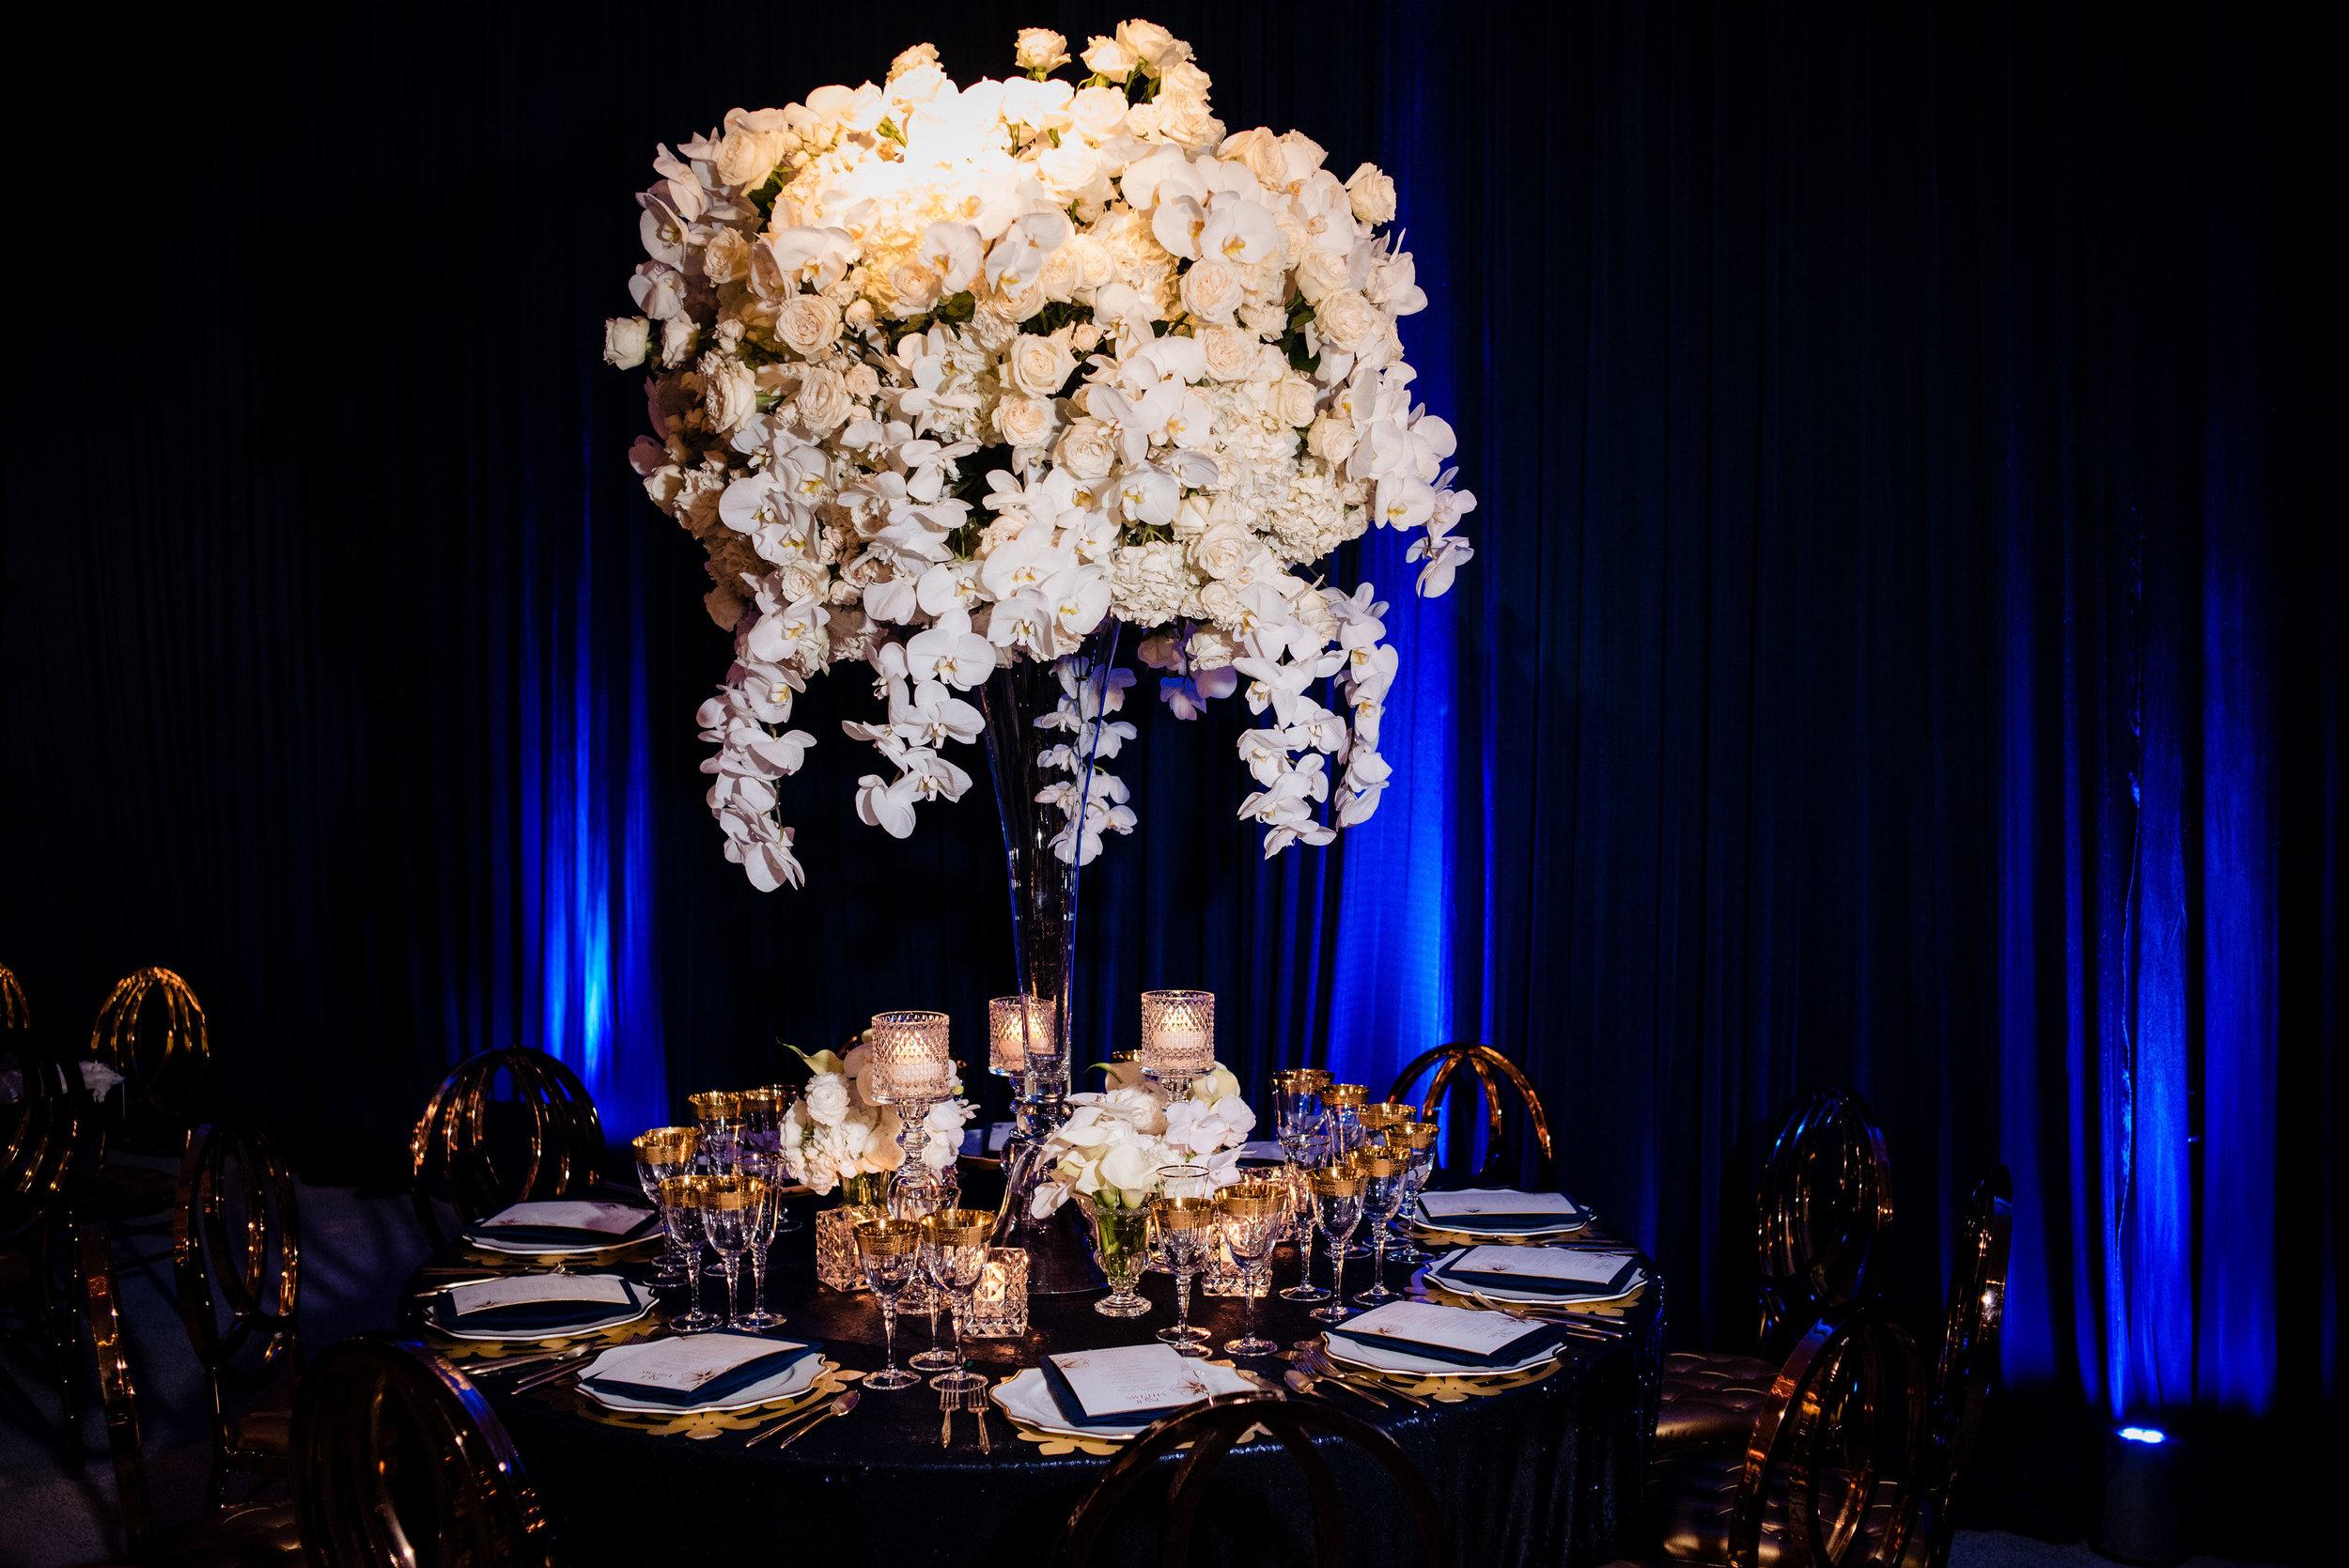 INDIAN WEDDING CENTERPIECE.JPG